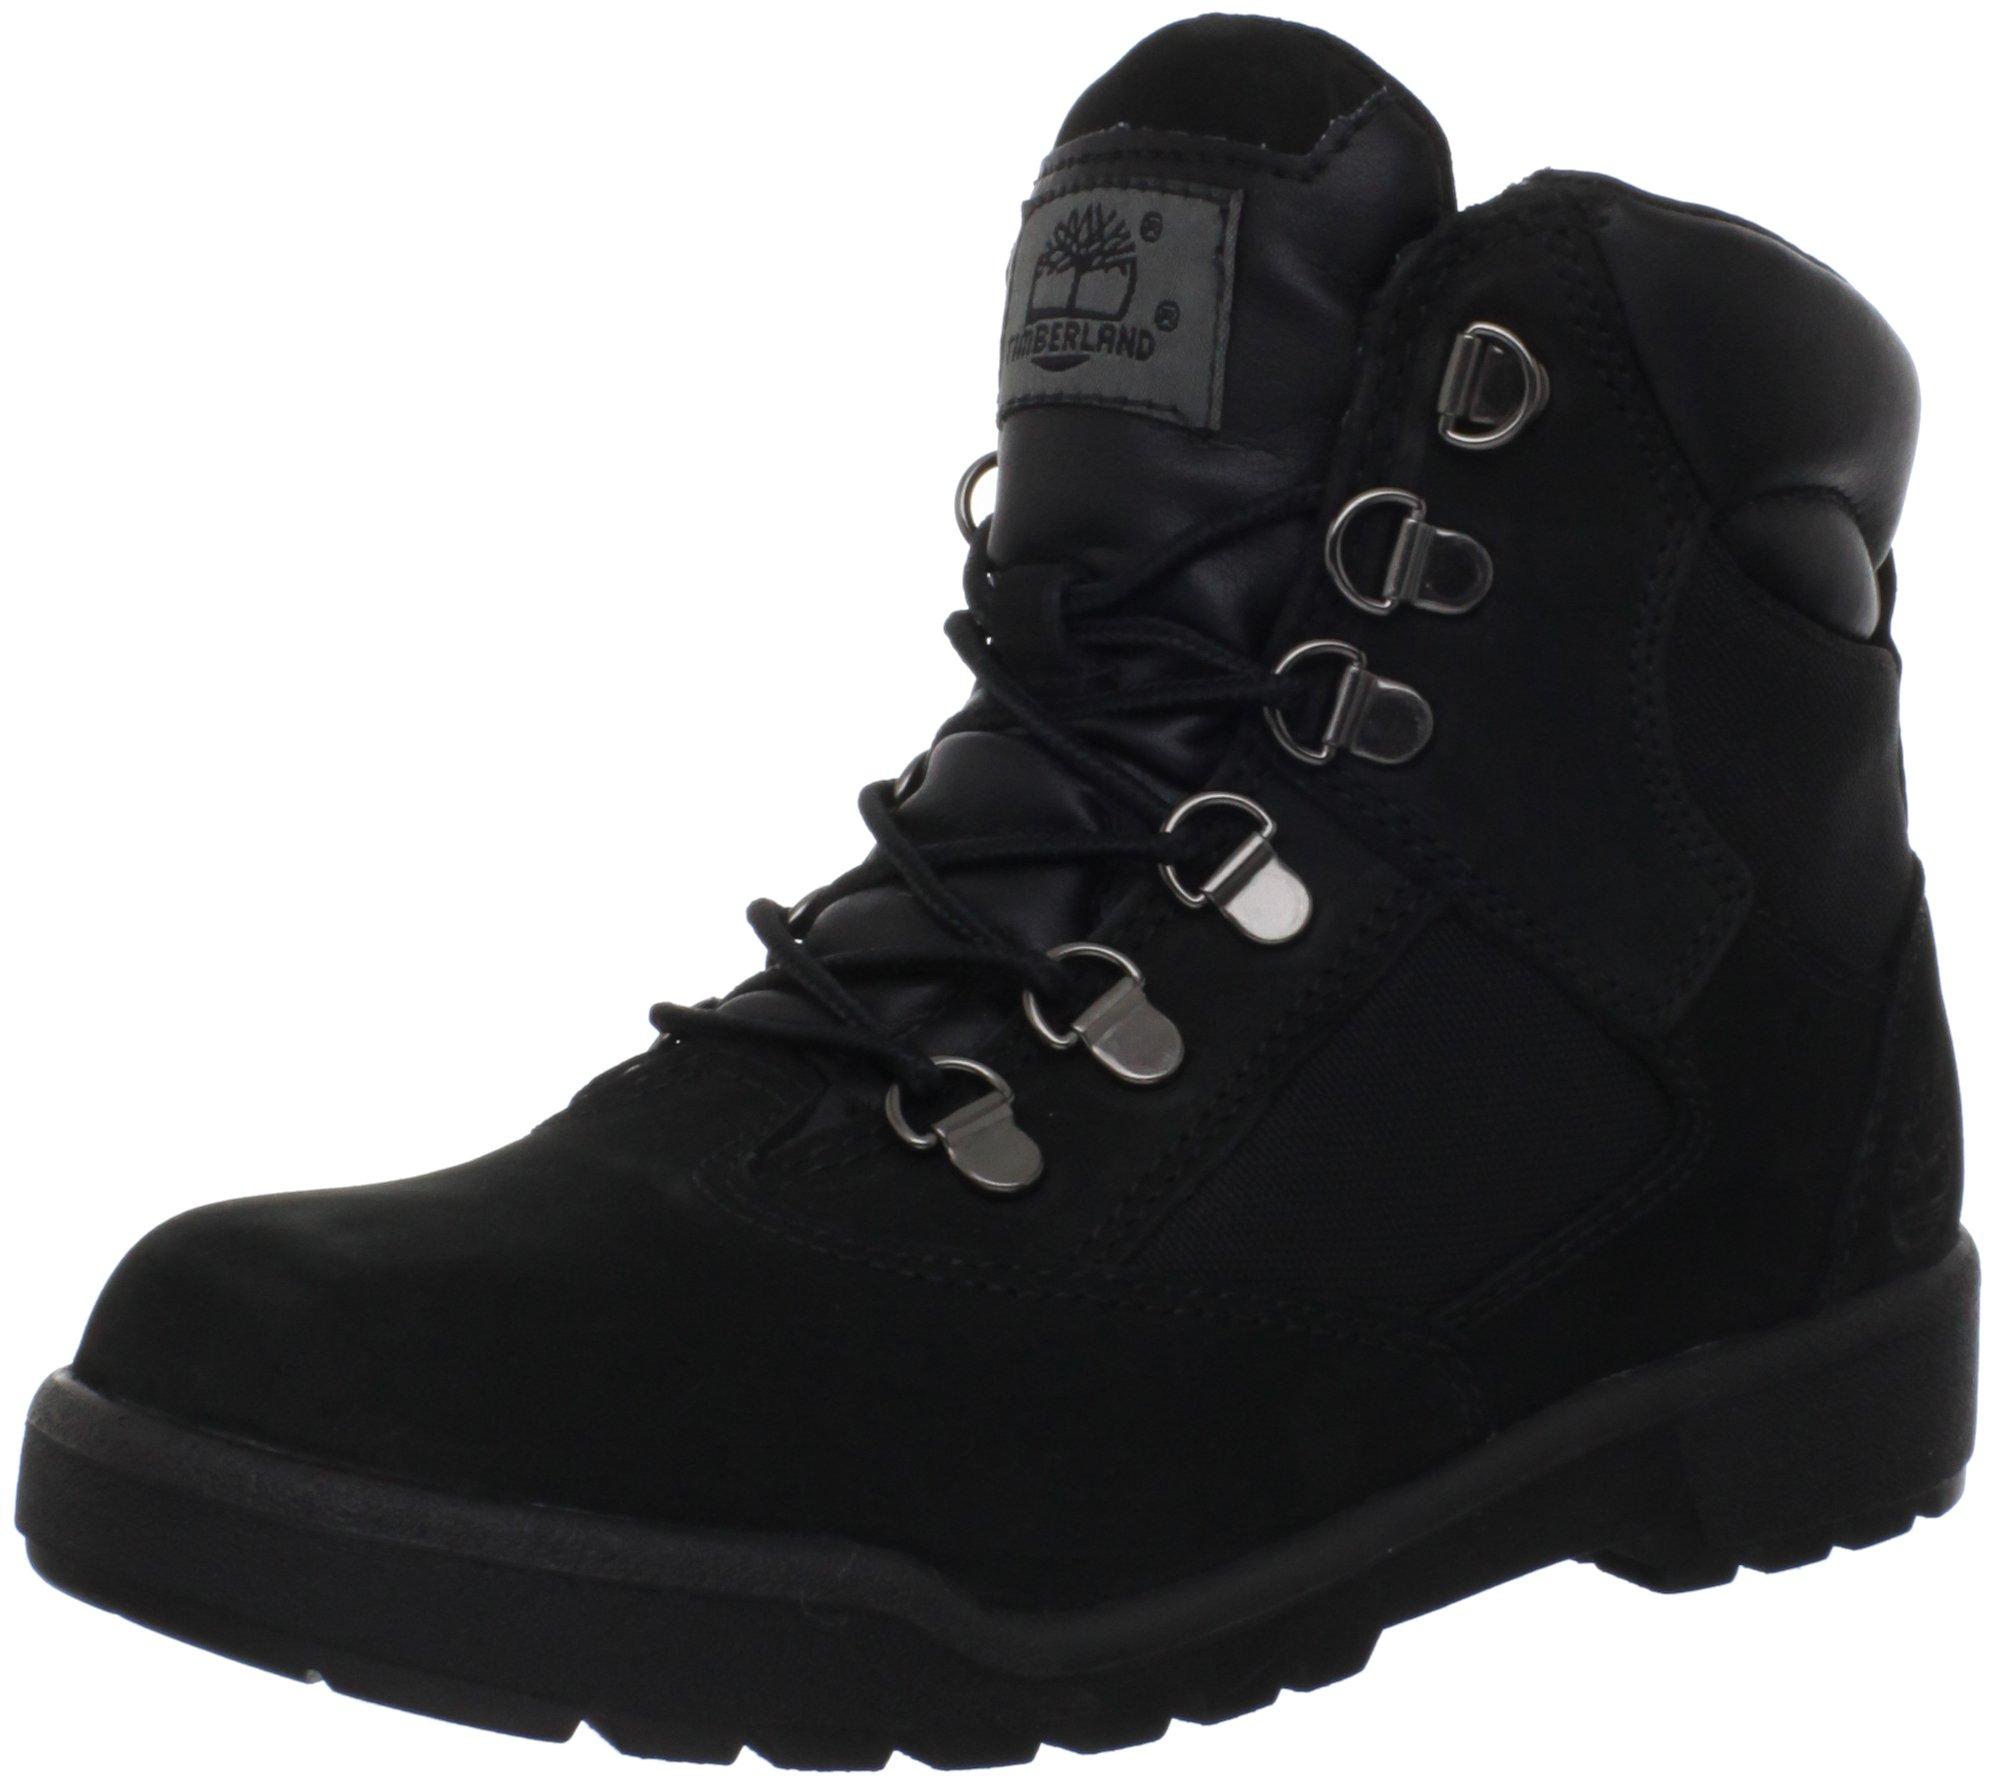 Timberland 6-Inch Leather and Fabric Field Boot (Toddler/Little Kid/Big Kid),Black Nubuck,4.5 M US Big Kid